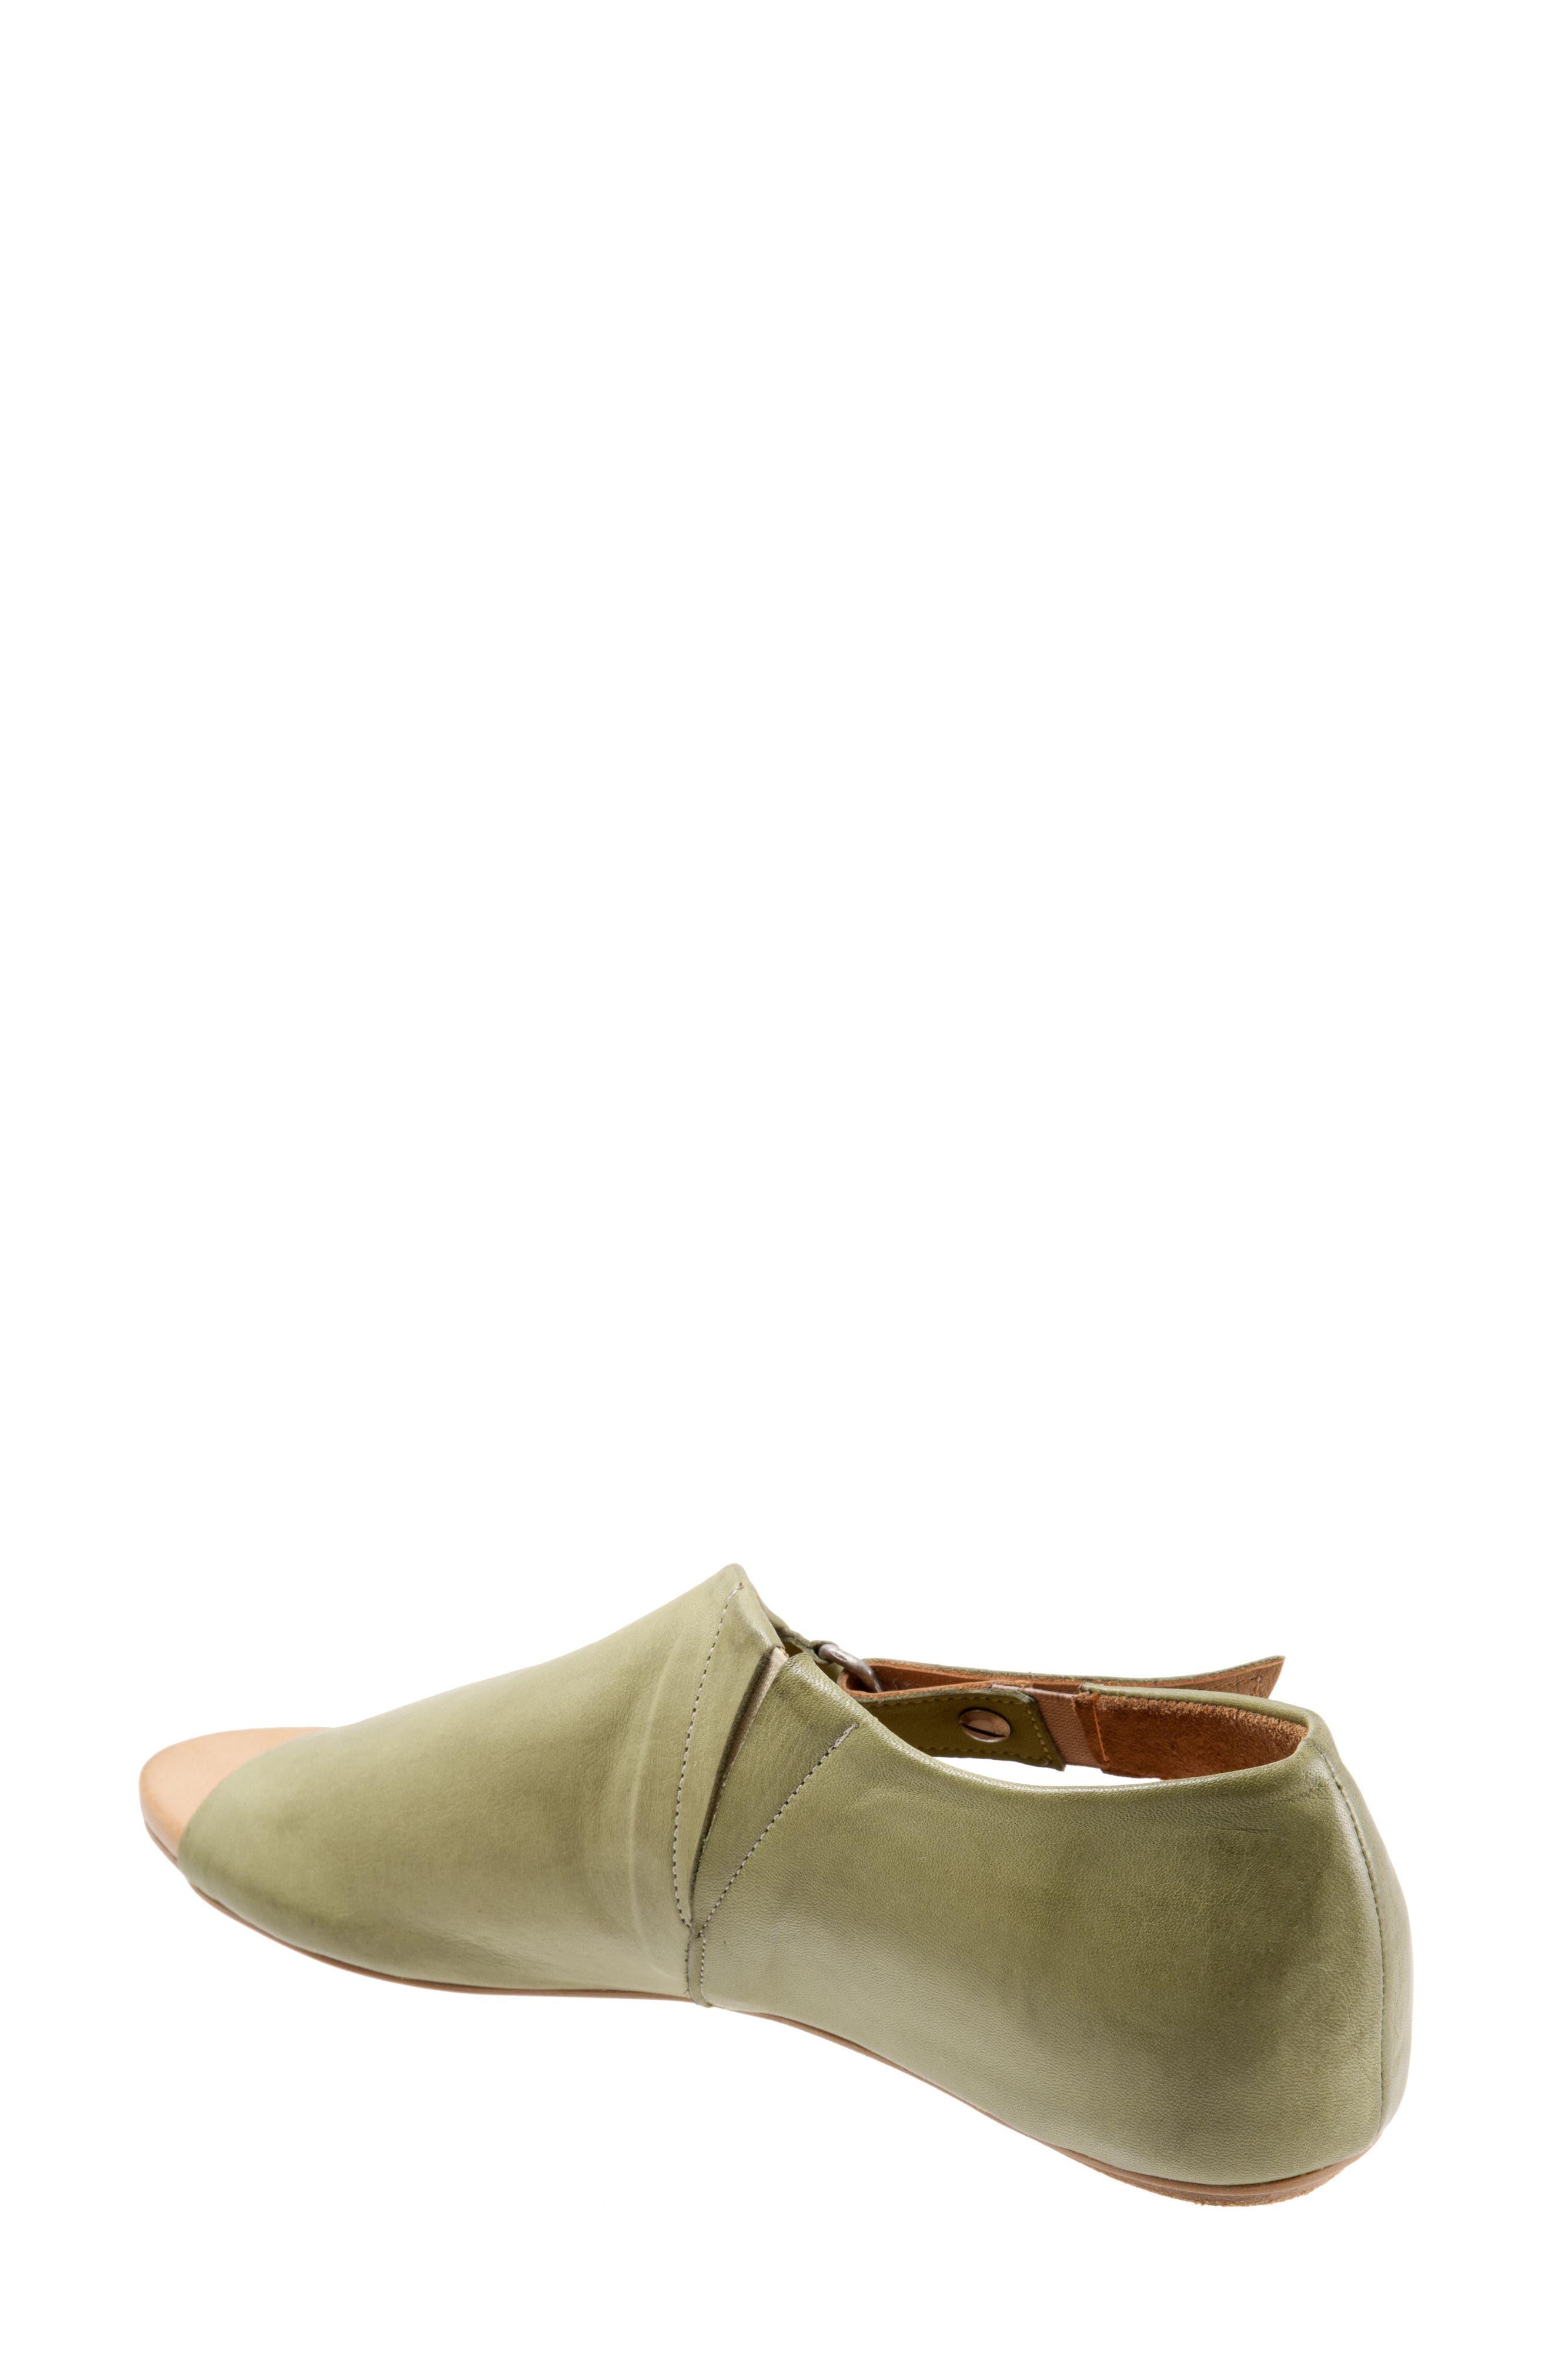 Kale Sandal,                             Alternate thumbnail 2, color,                             Moss Leather